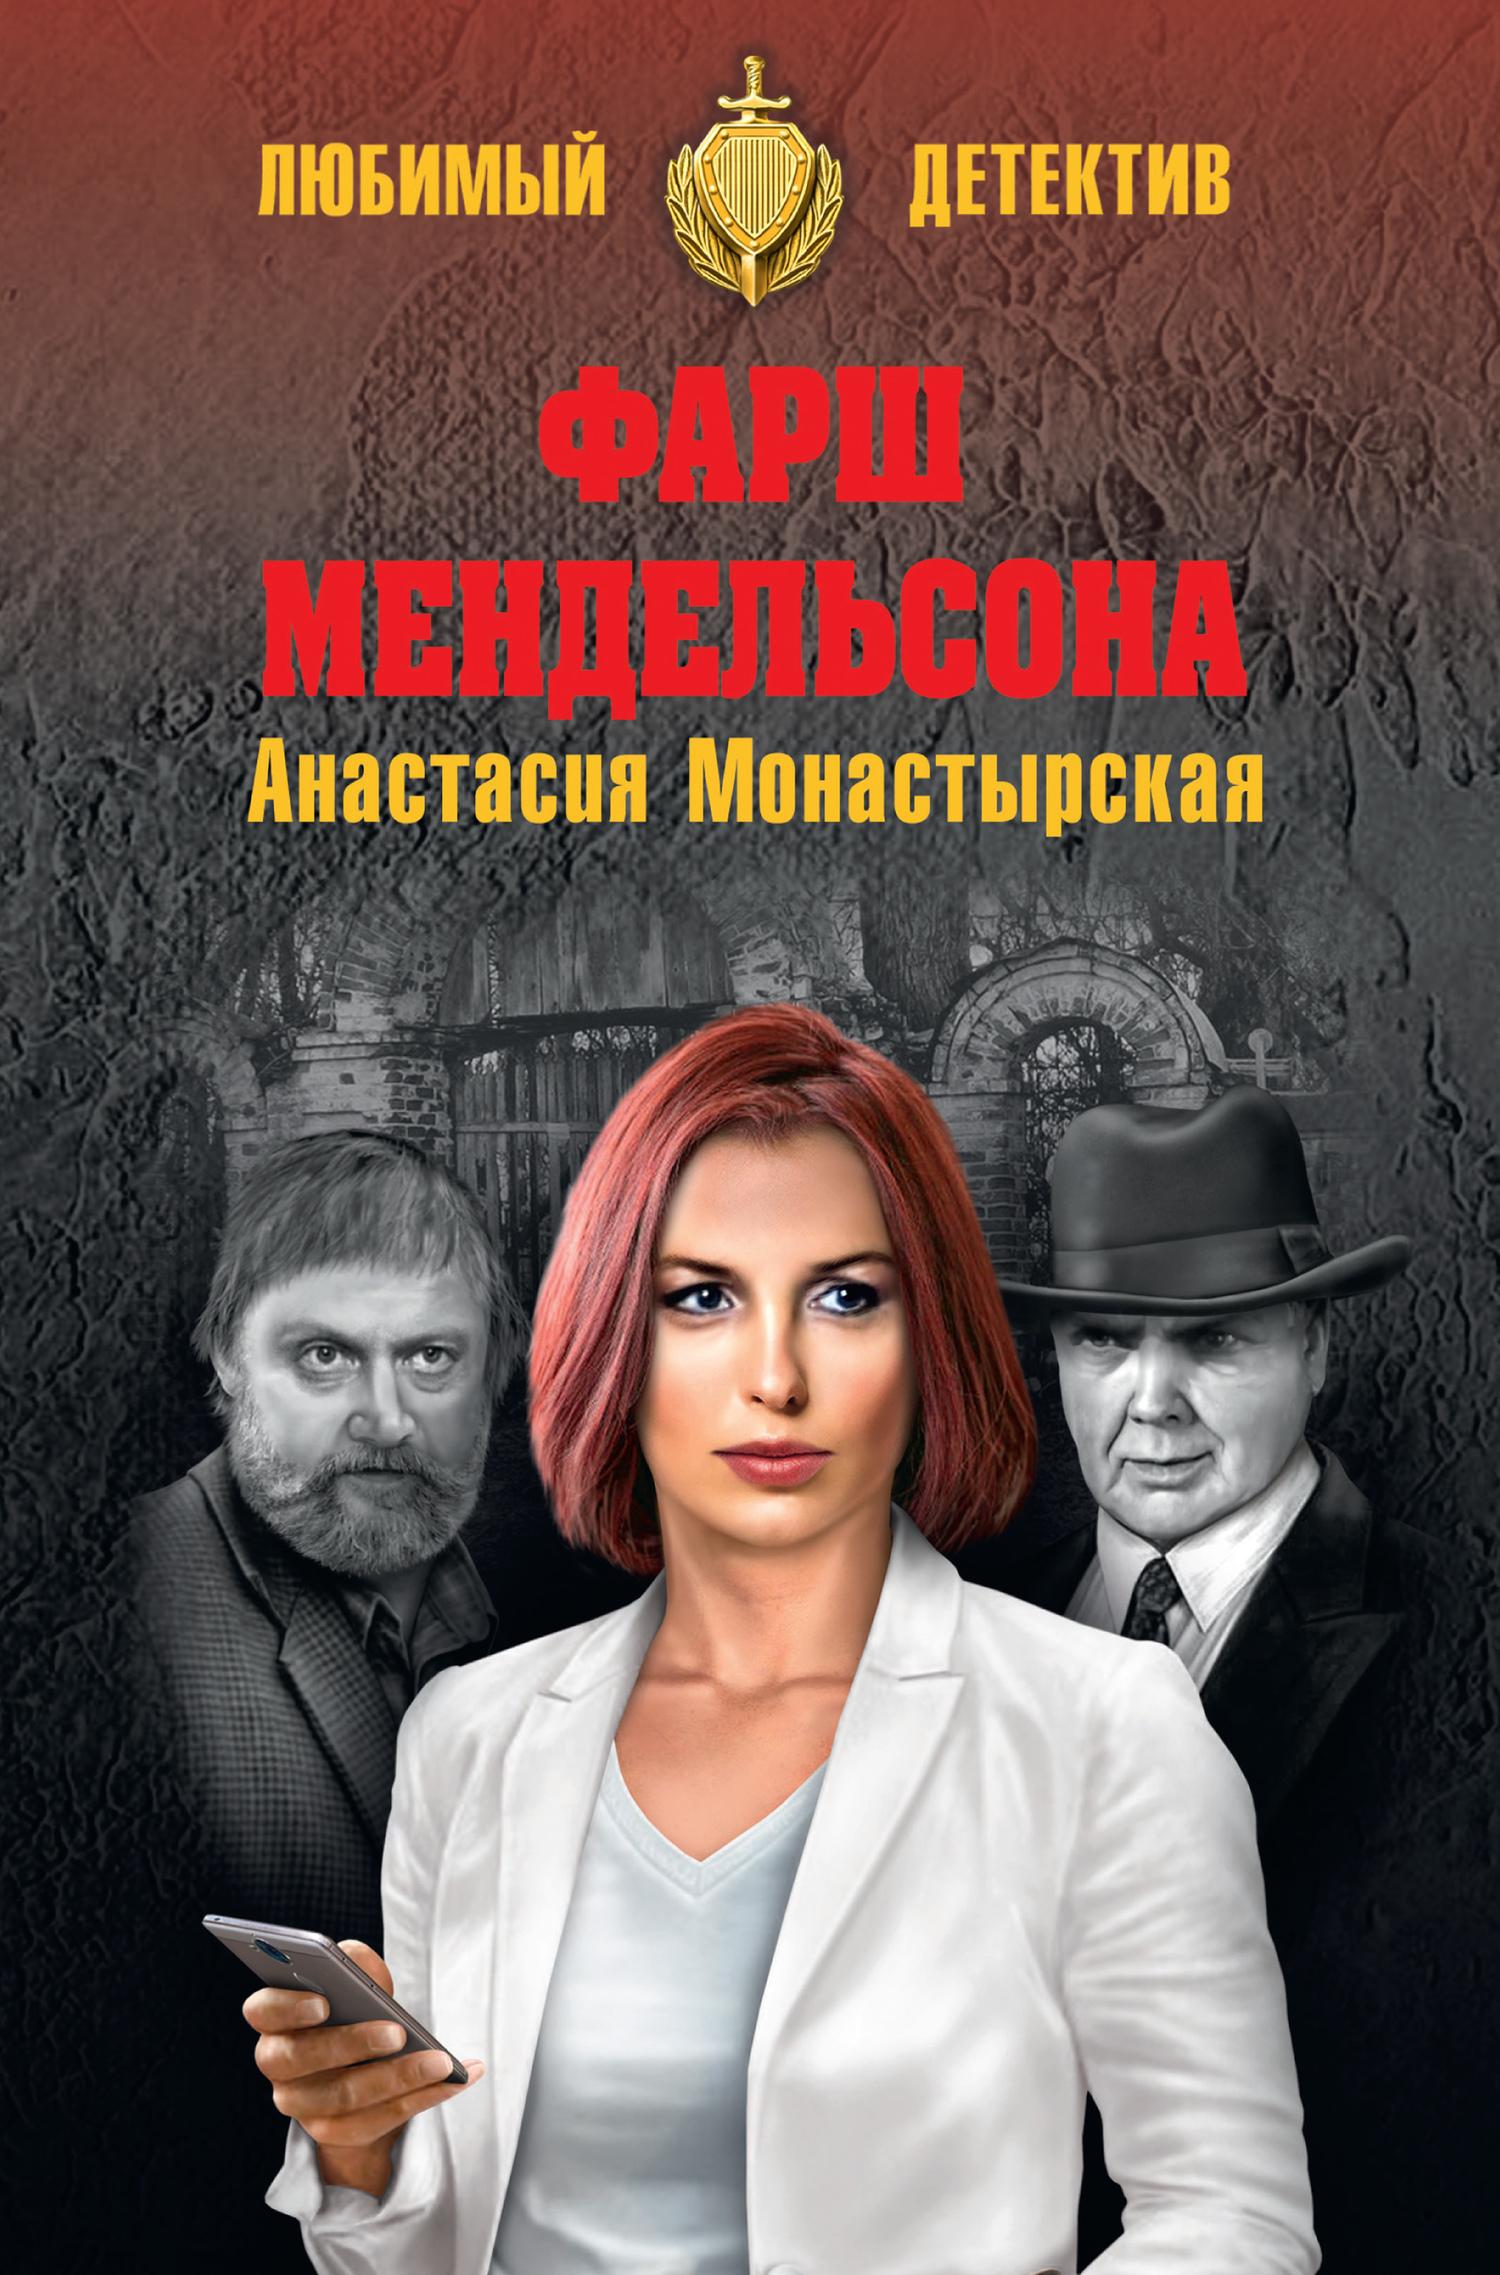 Анастасия Монастырская - Фарш Мендельсона